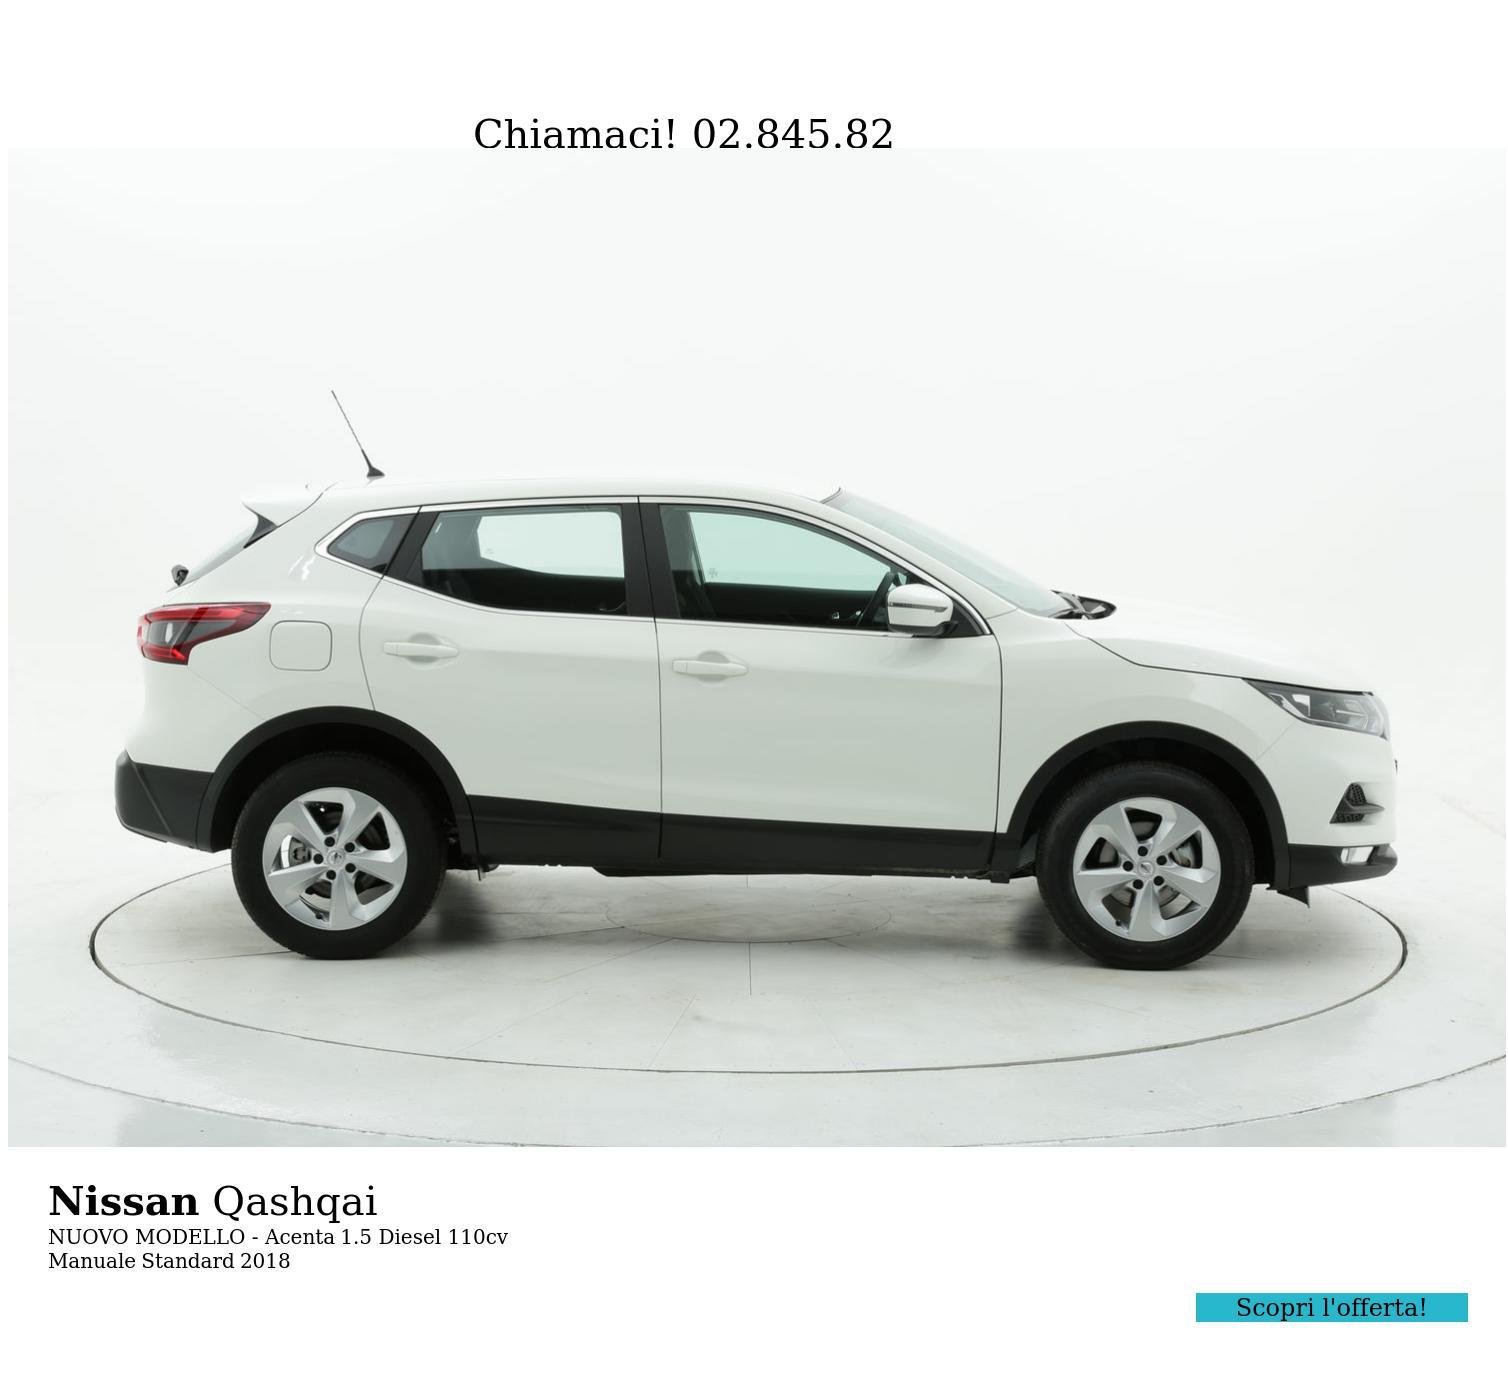 Nissan Qashqai NUOVO MODELLO - Acenta km 0 diesel bianca   brumbrum